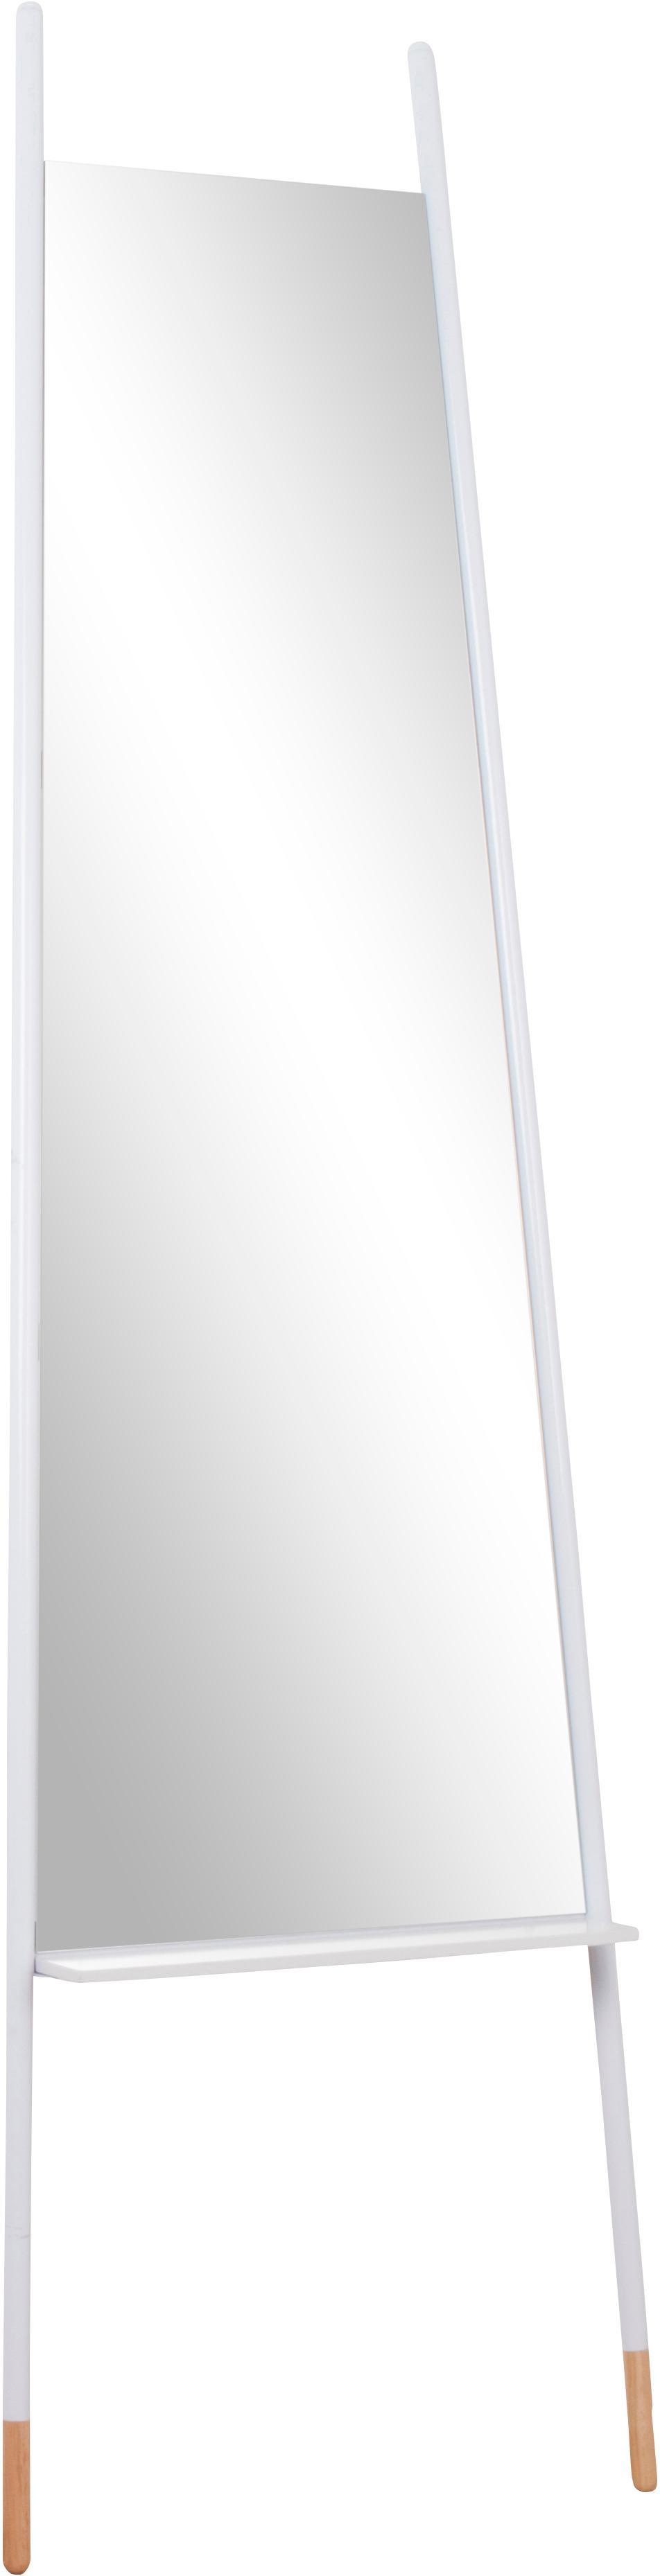 Espejo de pie Leaning Mirror, con estante, Espejo: cristal, Blanco, espejo, An 48 x Al 171cm